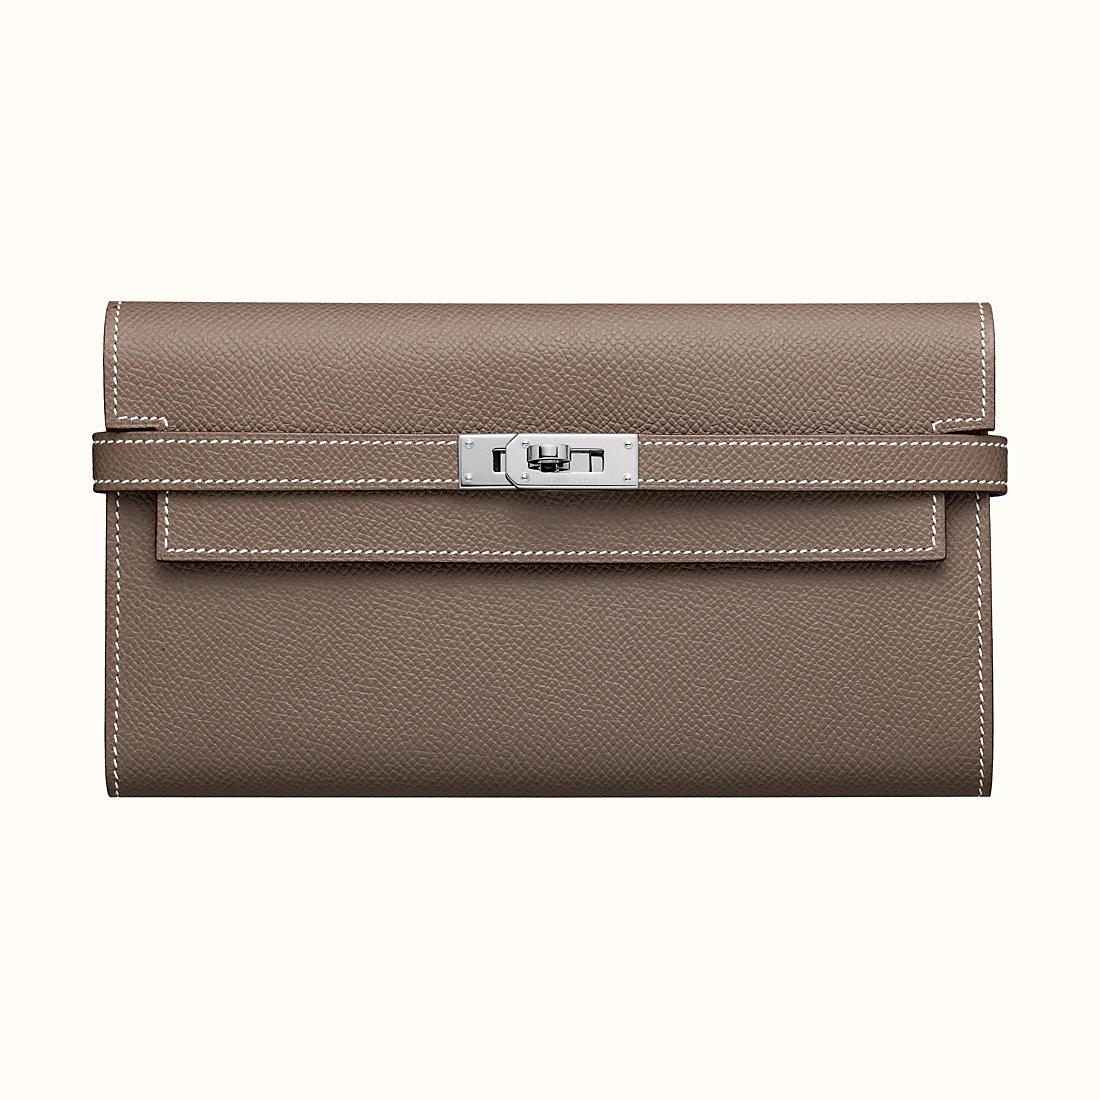 Hermes Kelly classic wallet CK18 Étoupe 大象灰 Epsom calfskin